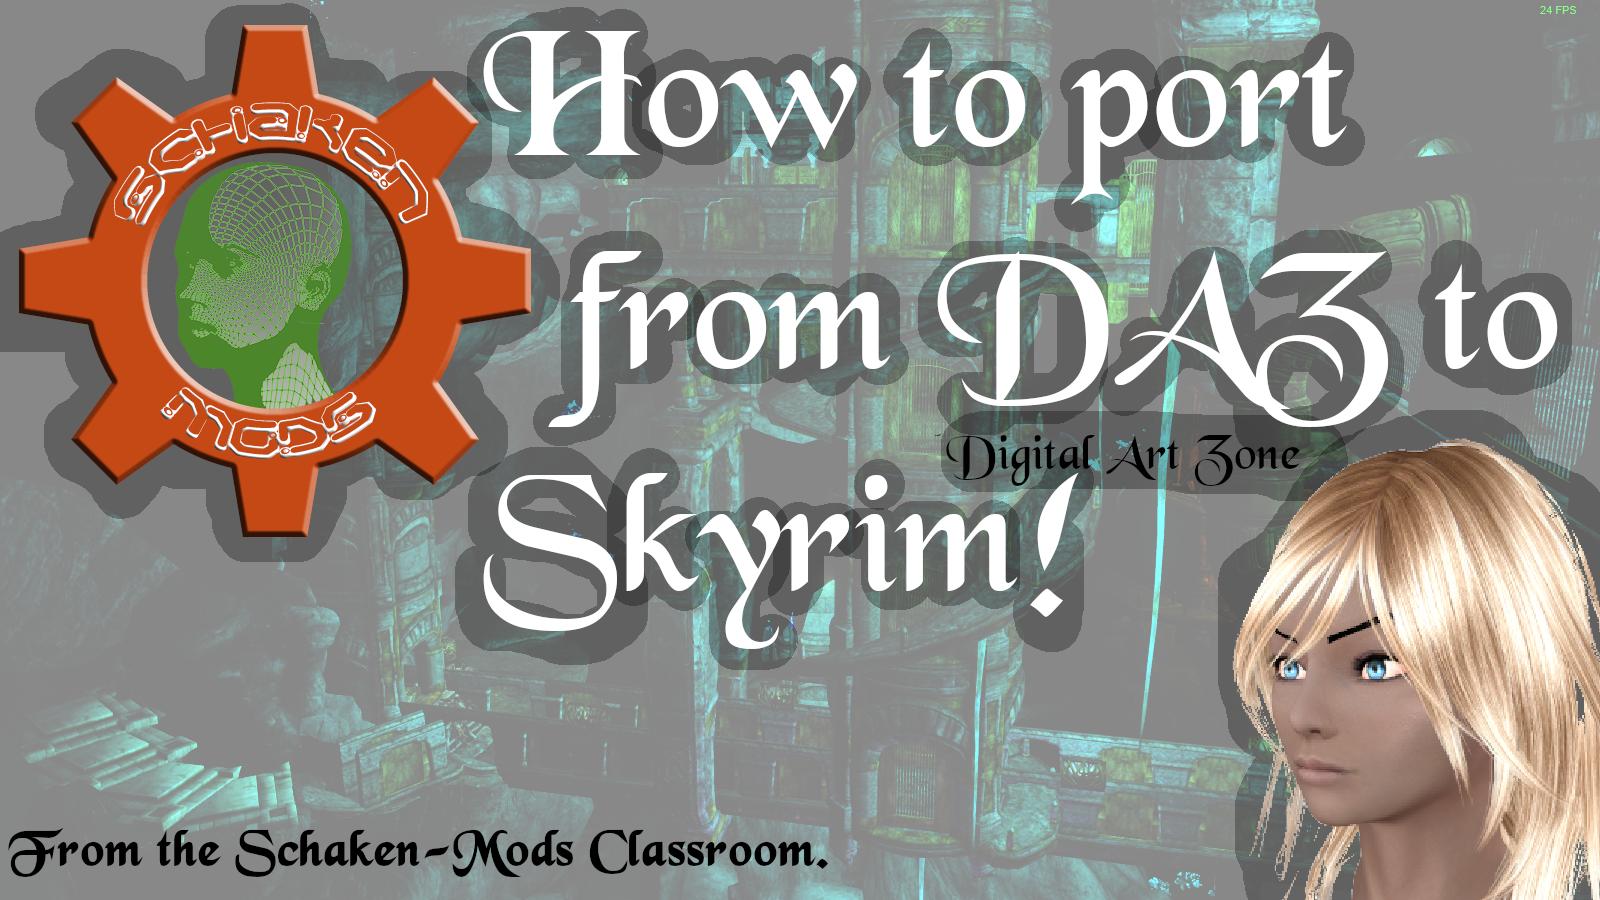 How To: Port DAZ to Skyrim